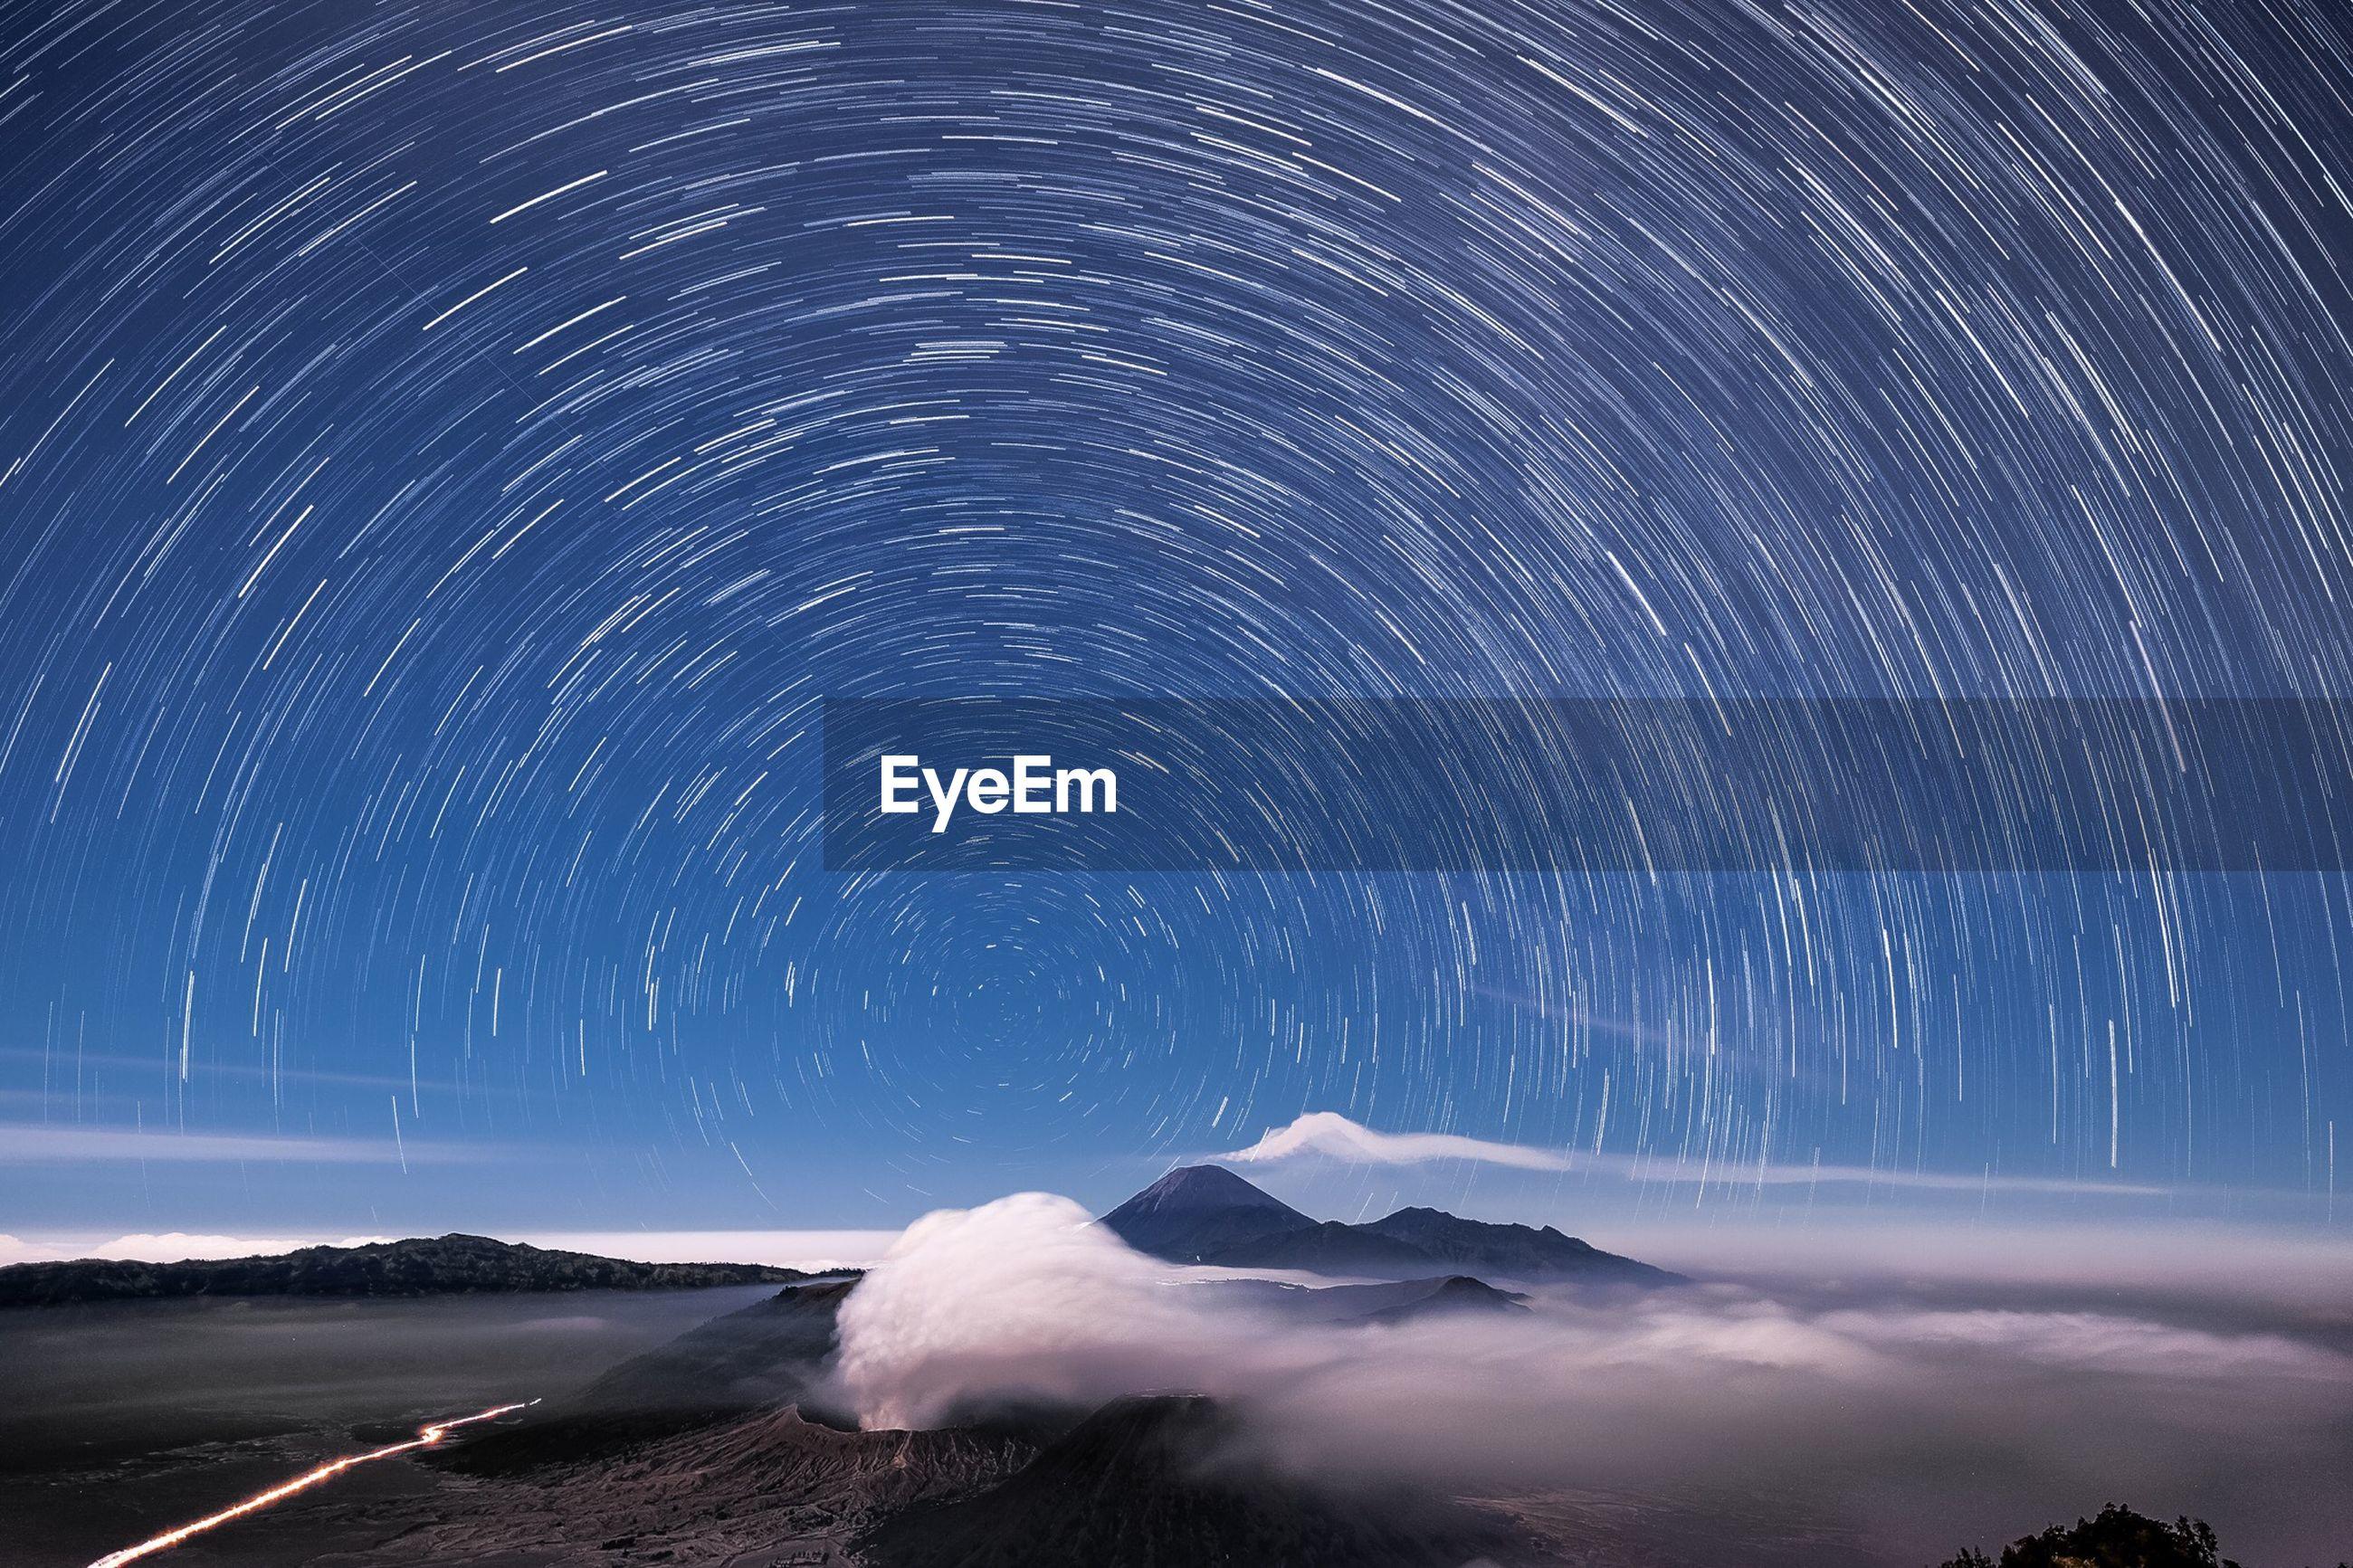 Long exposure image of stars in sky at night